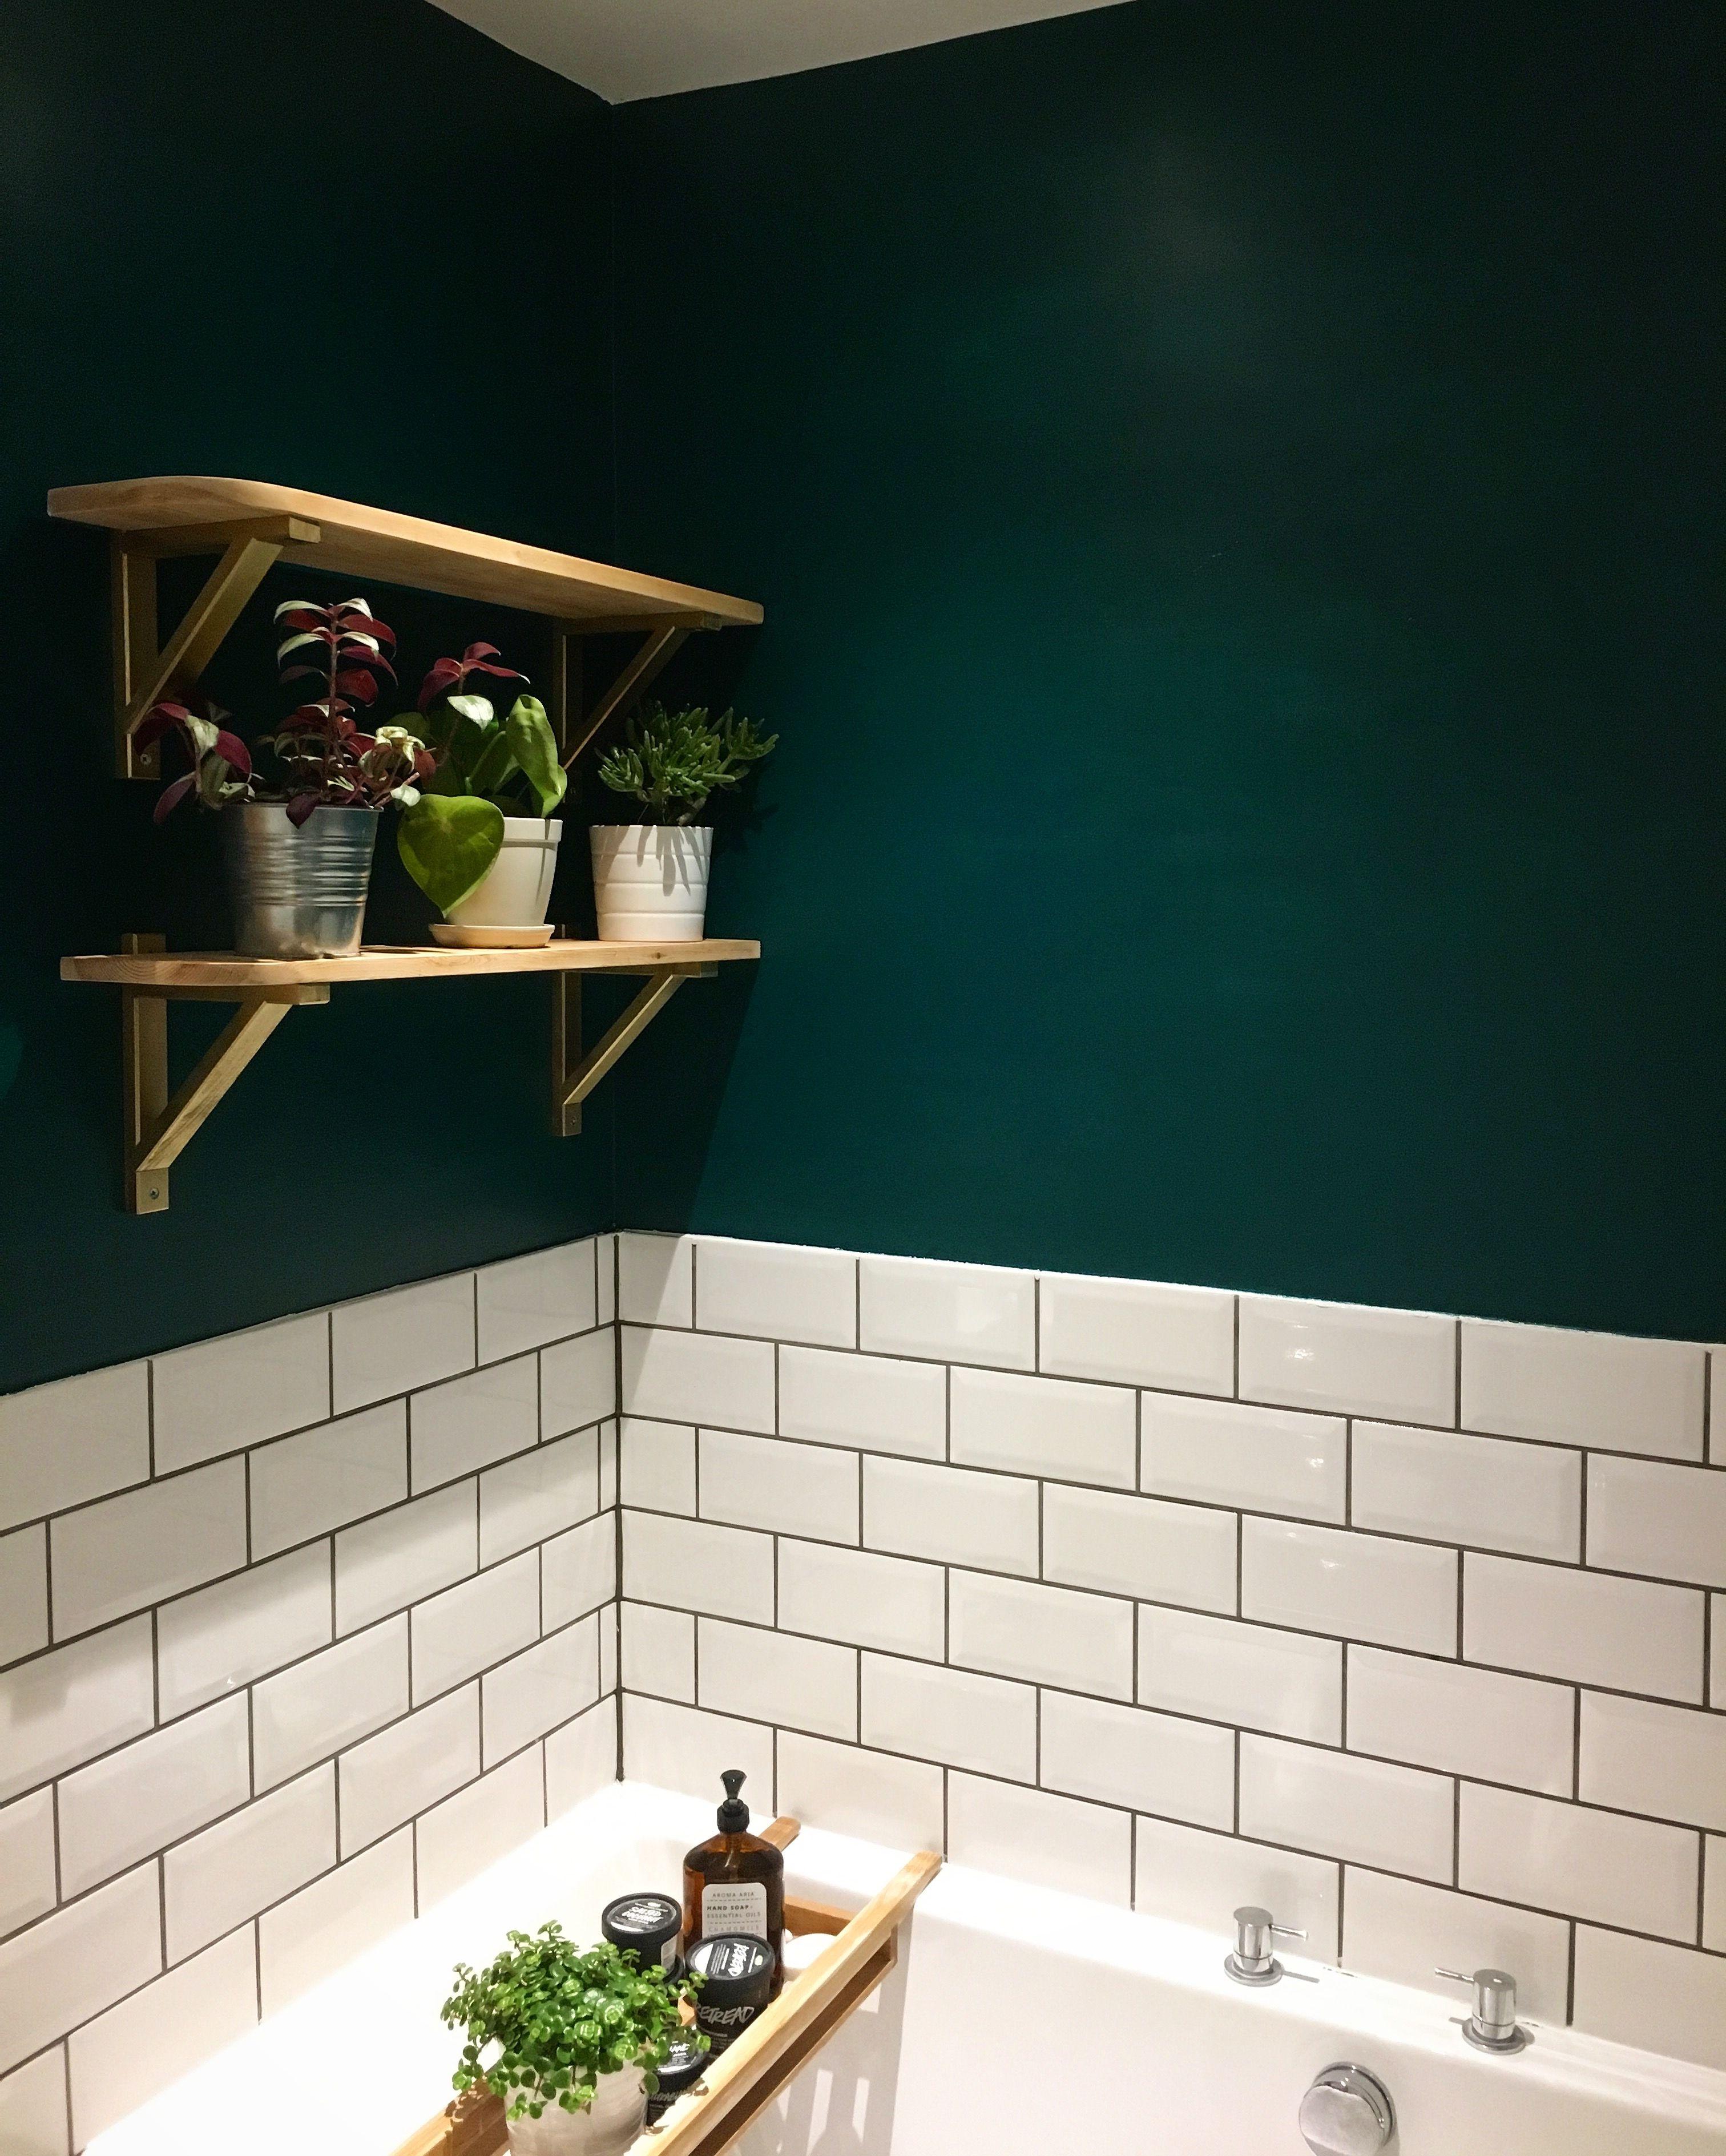 New Gorgeous Dark Green Bathroom Using Deep Green Sea By Valspar Paint Ikea Erkby Shelf Brackets And T Green Bathroom Green Tile Bathroom Dark Green Bathrooms